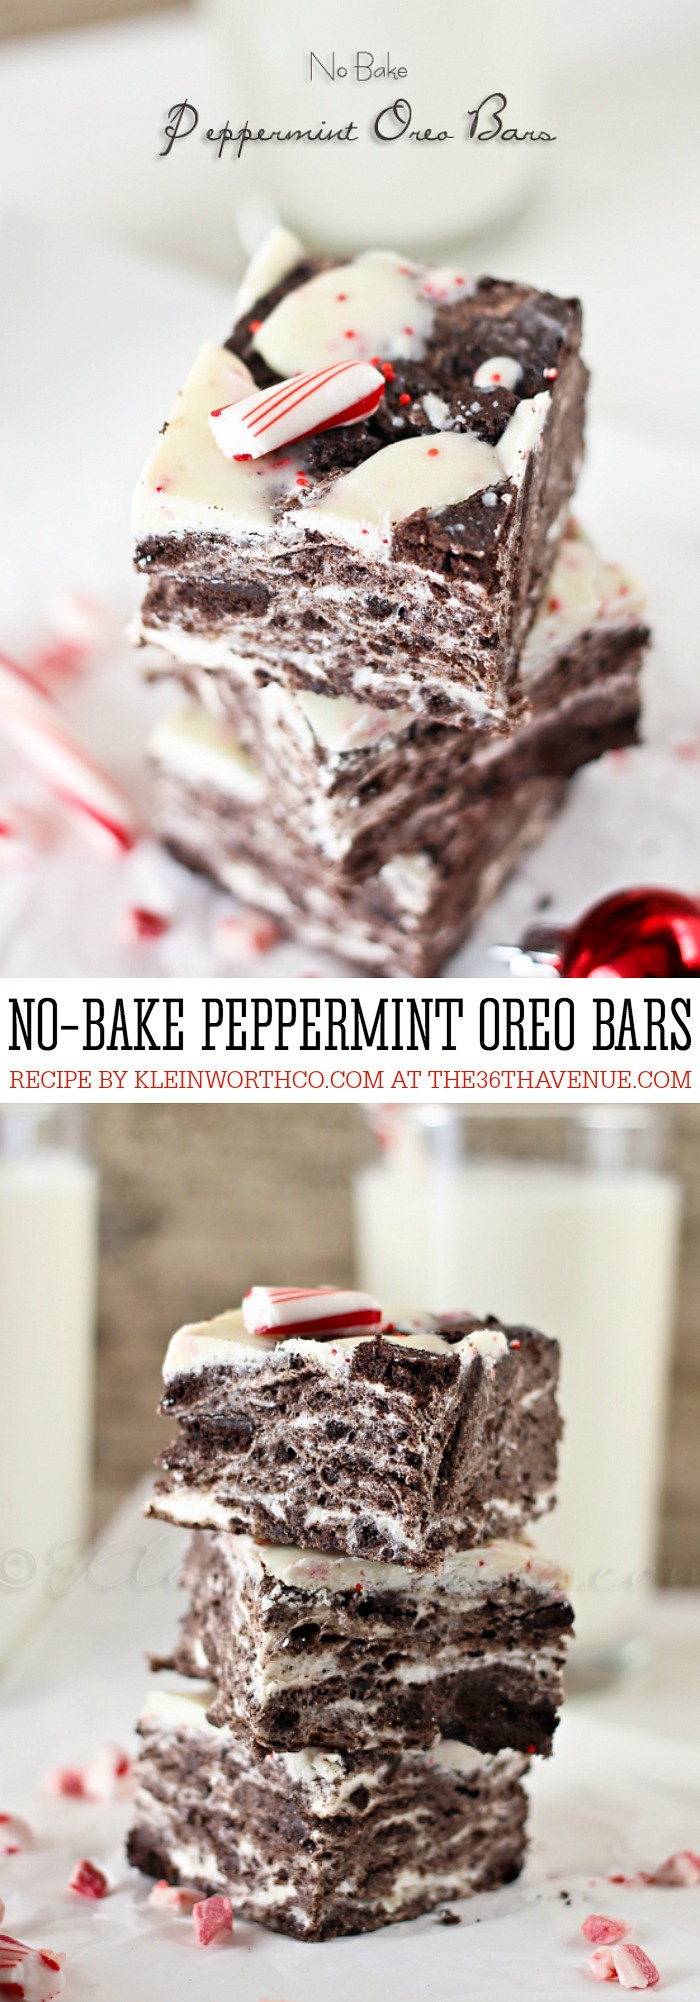 Christmas Oreo Desserts  No Bake Peppermint Oreo Bars The 36th AVENUE